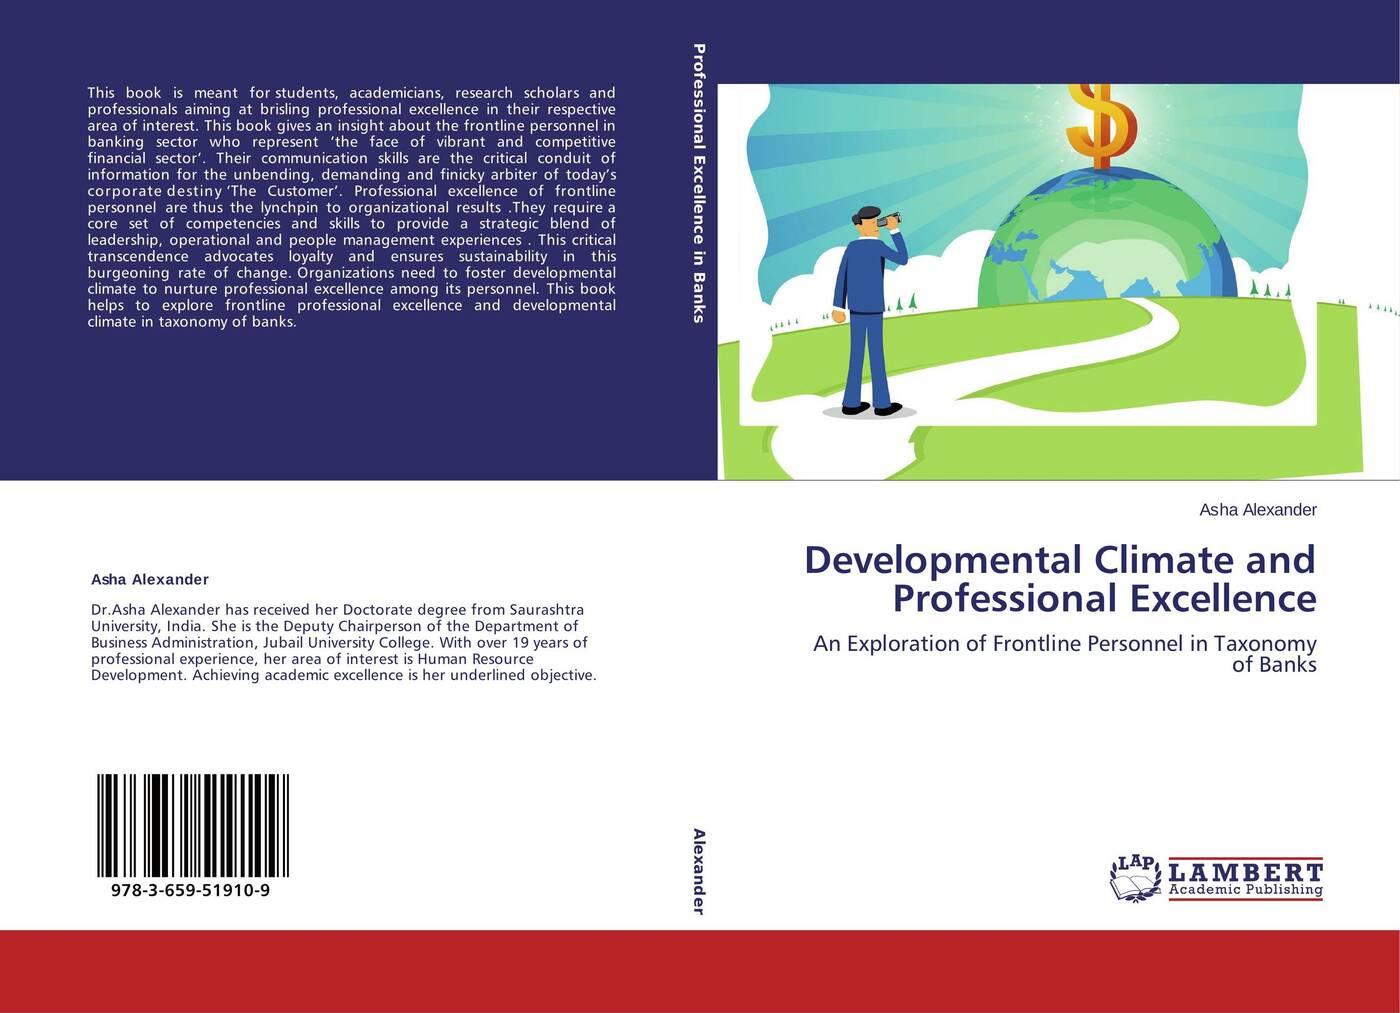 Asha Alexander Developmental Climate and Professional Excellence developmental climate and professional excellence